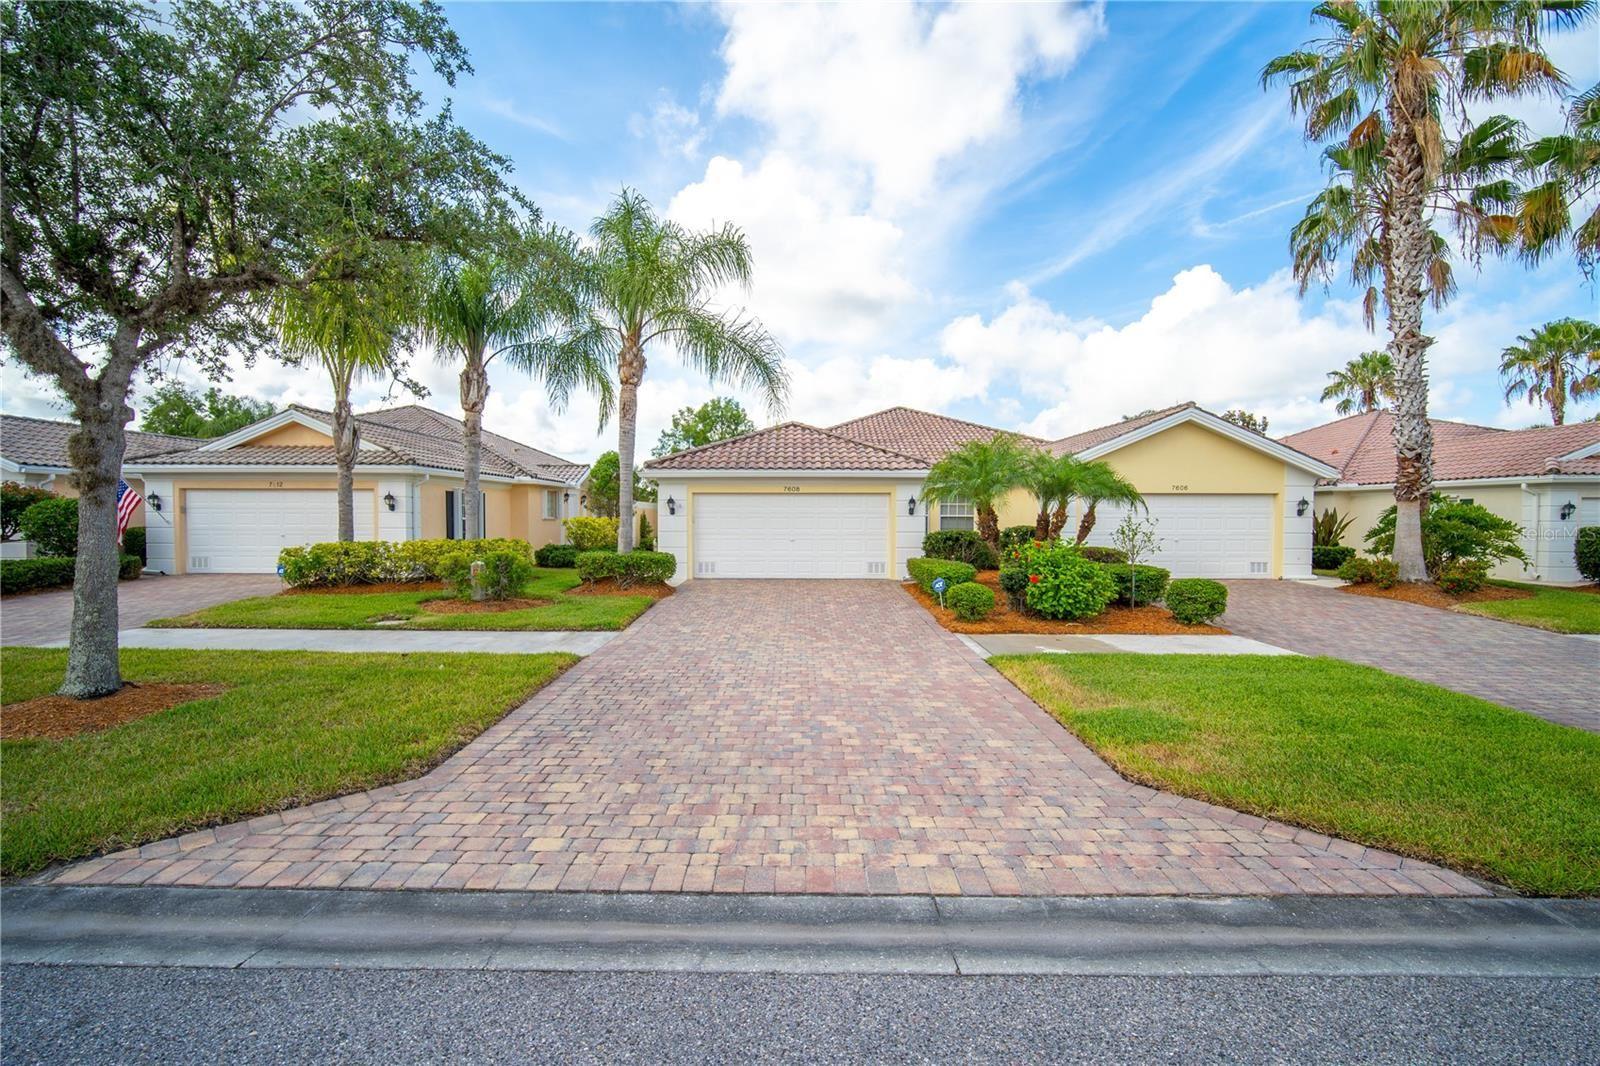 7608 CAMMINARE DRIVE, Sarasota, FL 34238 - #: A4503480